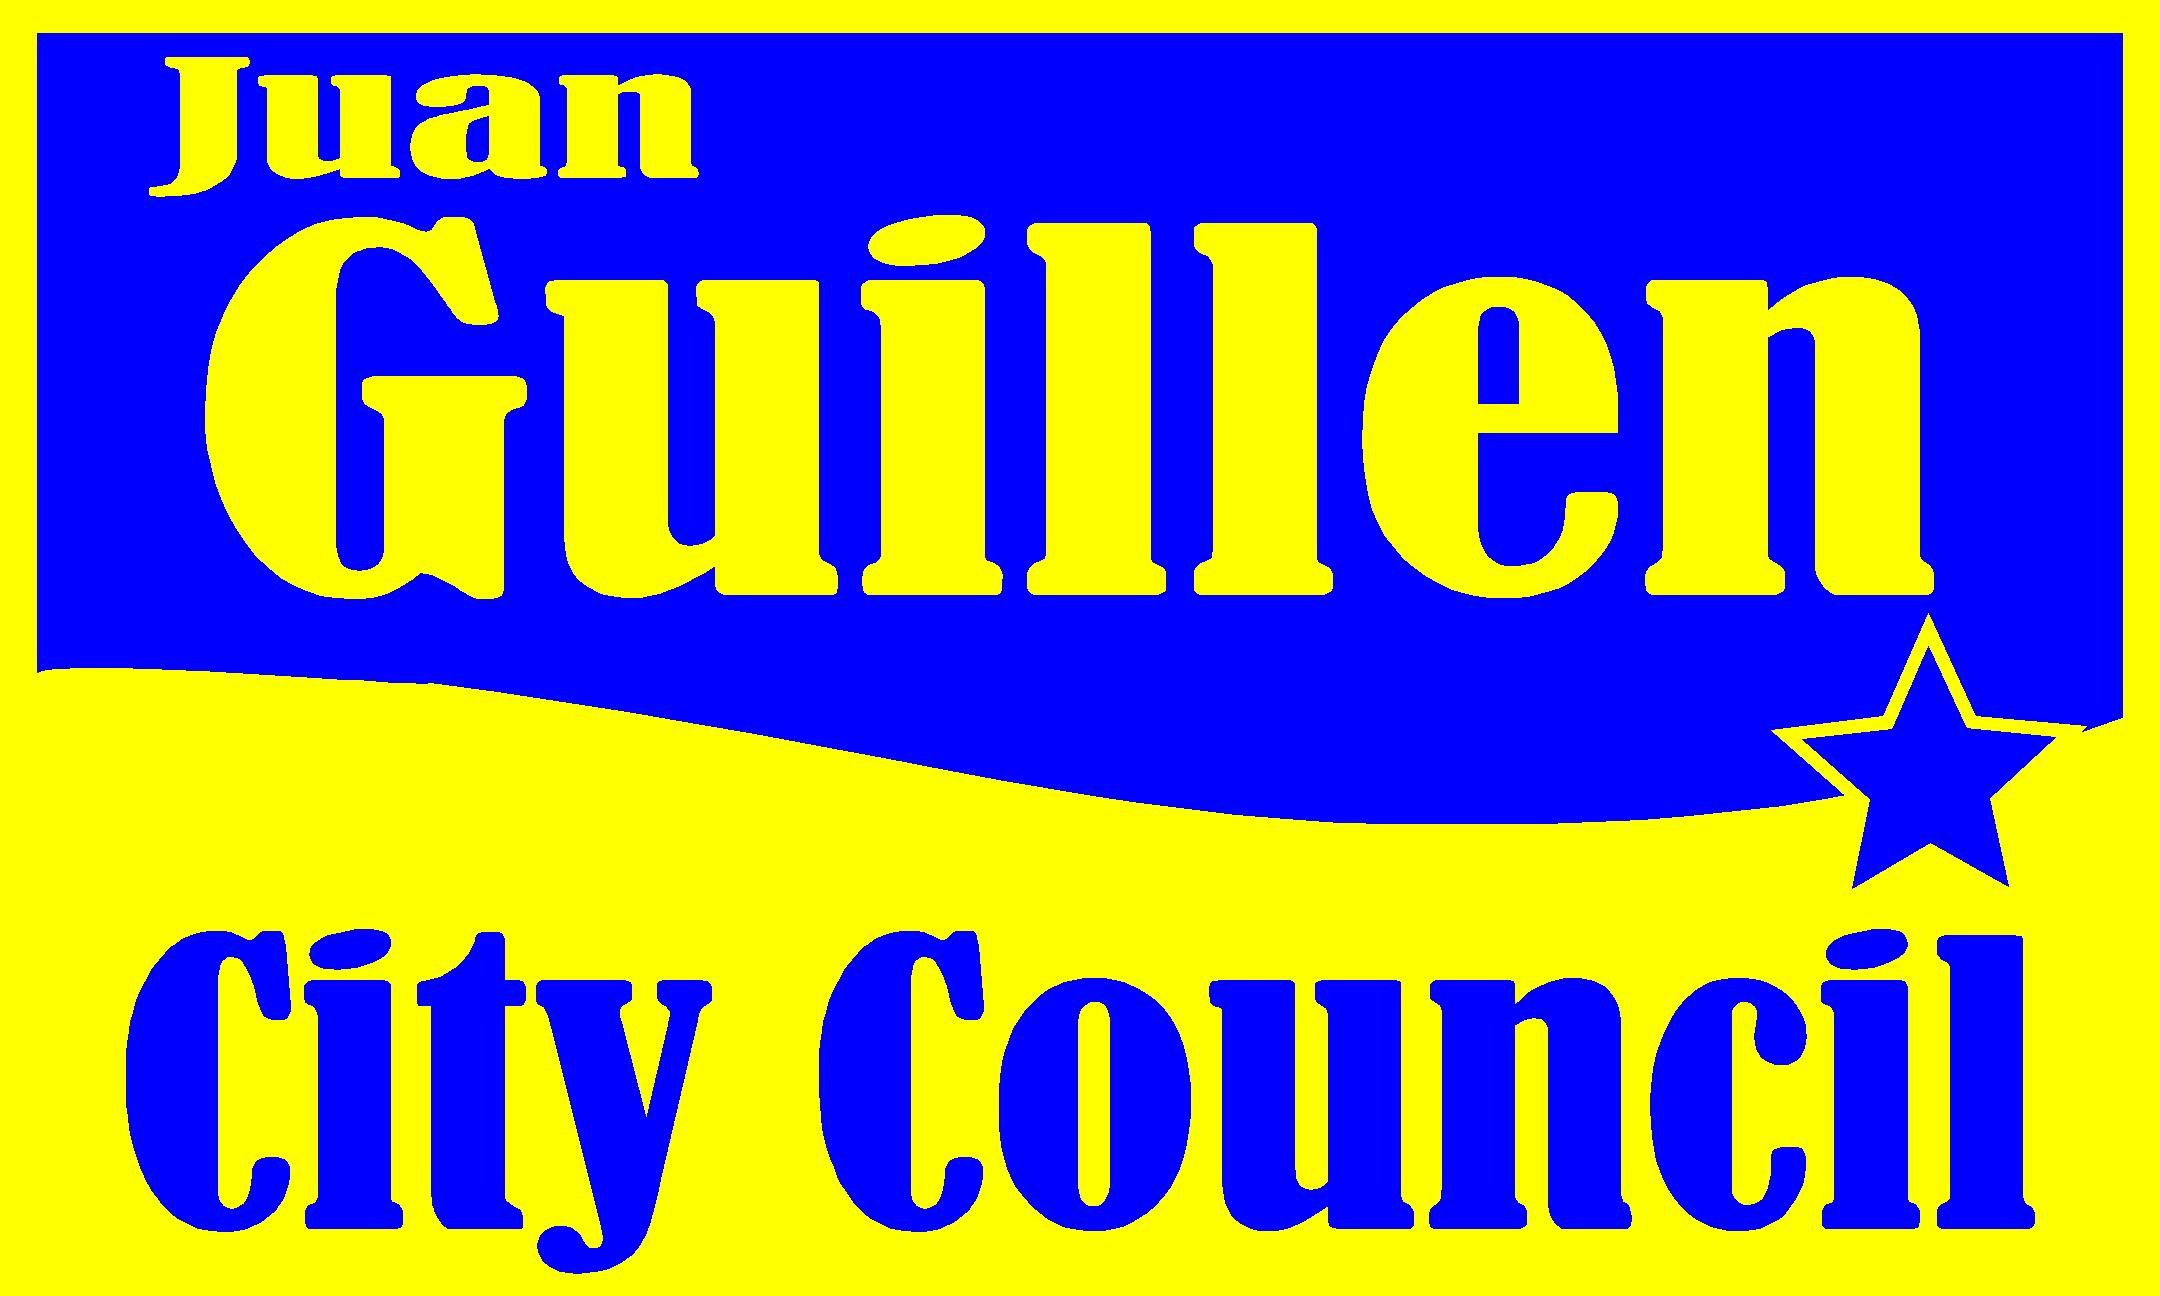 city_council_sign.jpg